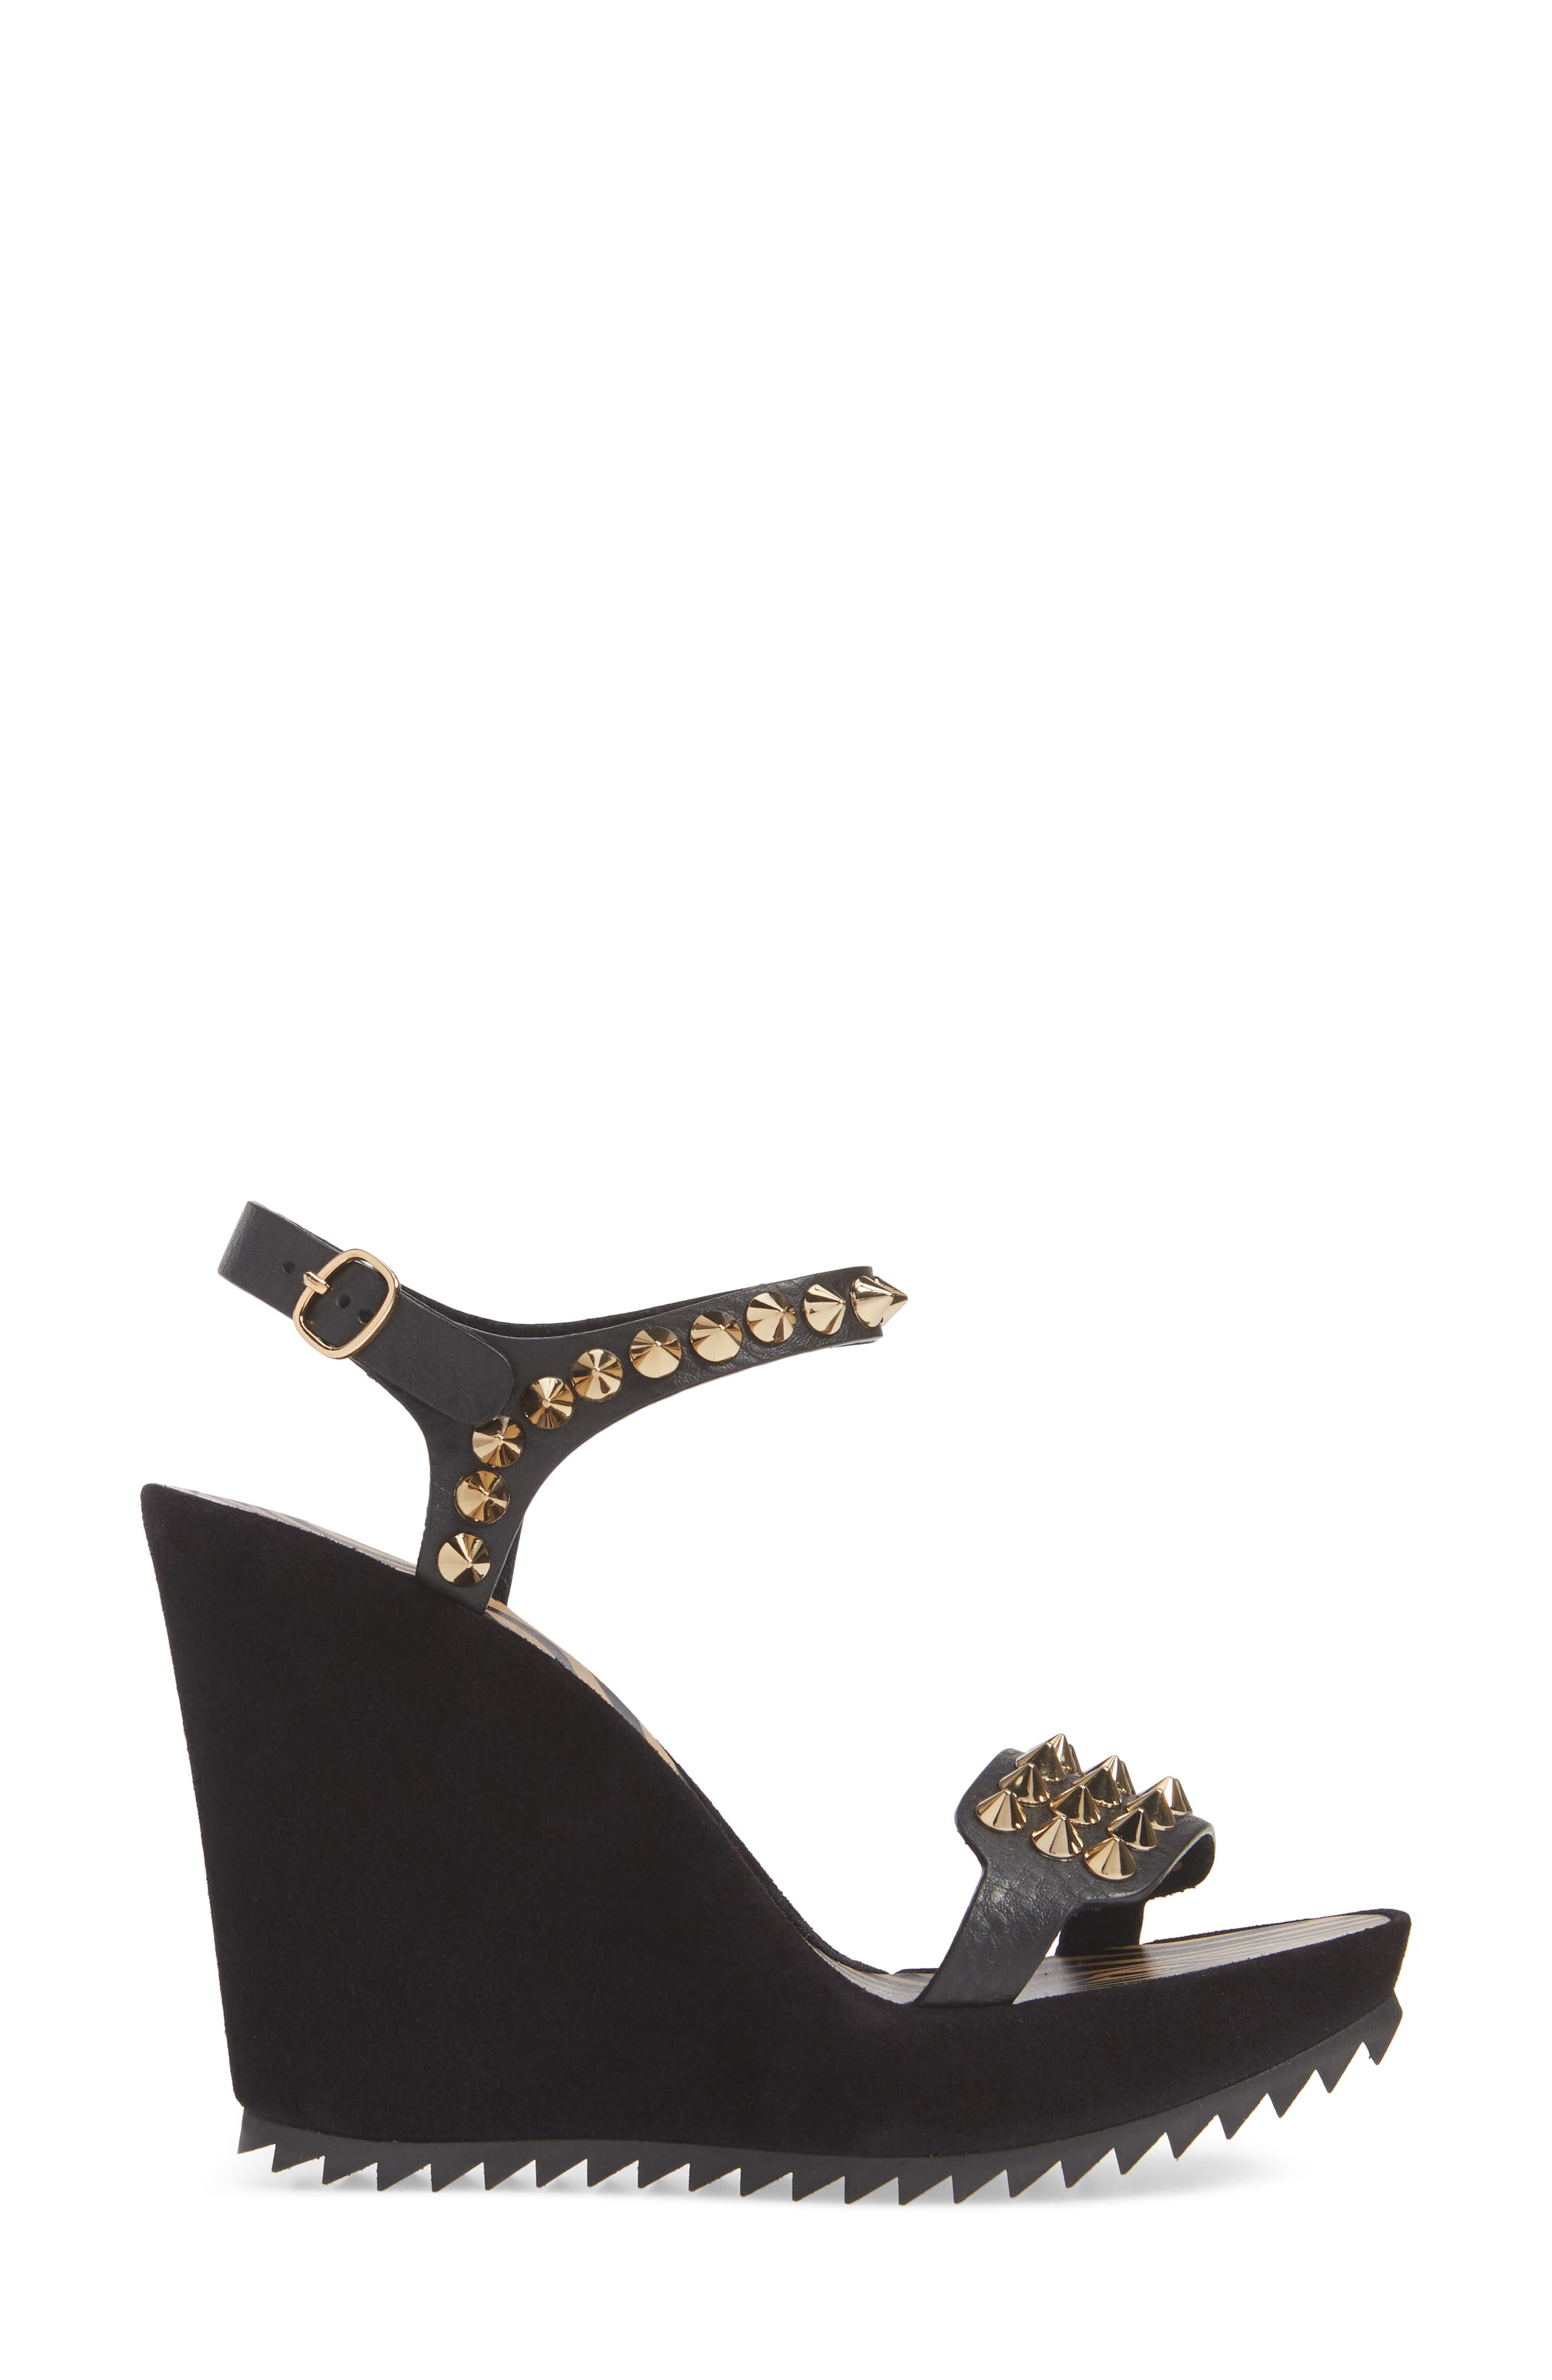 PEDRO GARCIA, Voka Studded Wedge Sandal, Alternate thumbnail 3, color, BLACK SUEDE